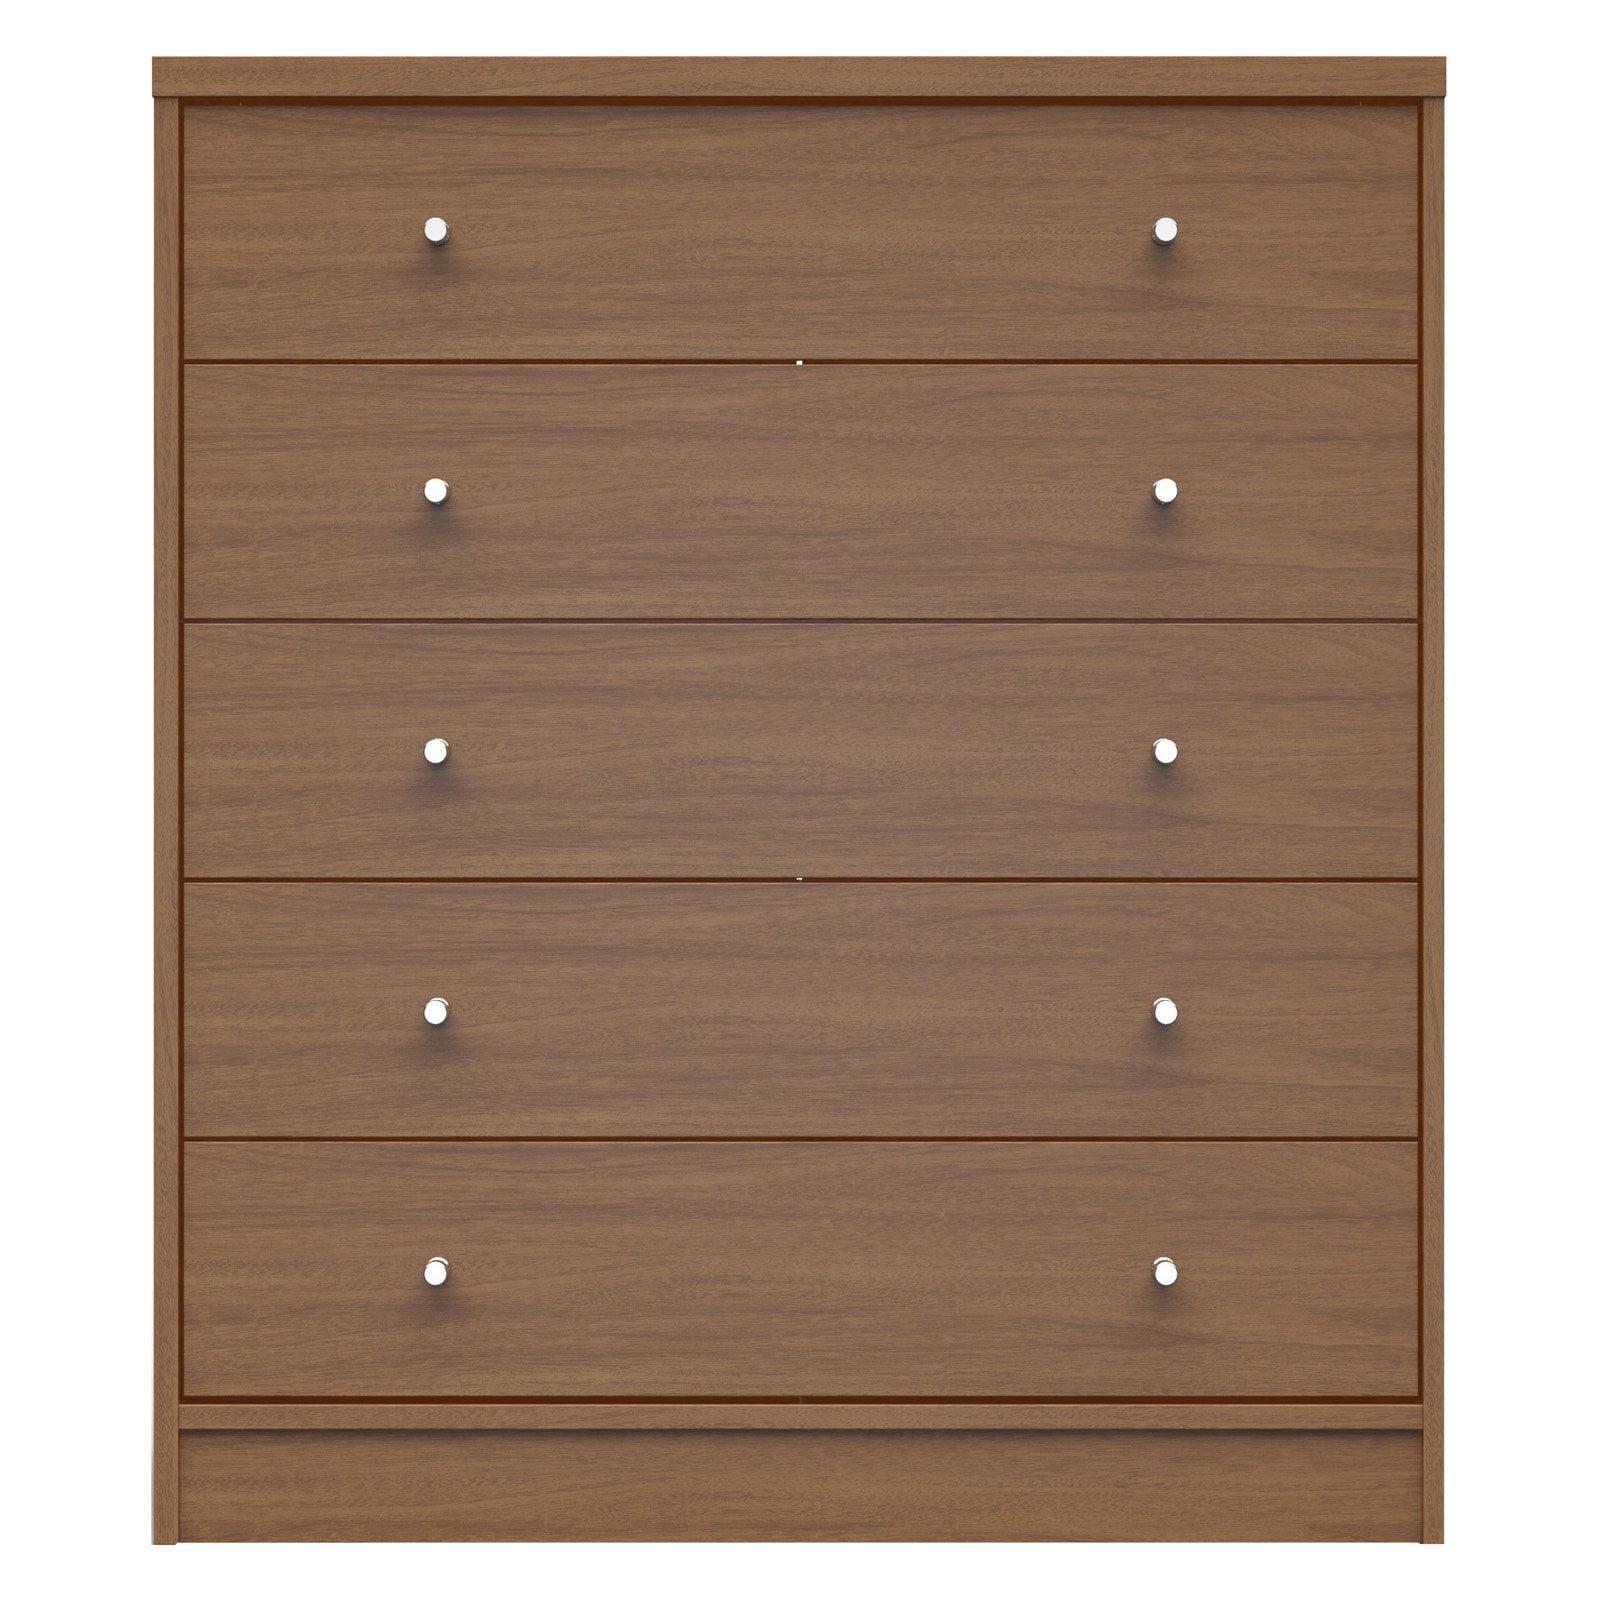 Manhattan Comfort Astor 2.0 5 Drawer Dresser